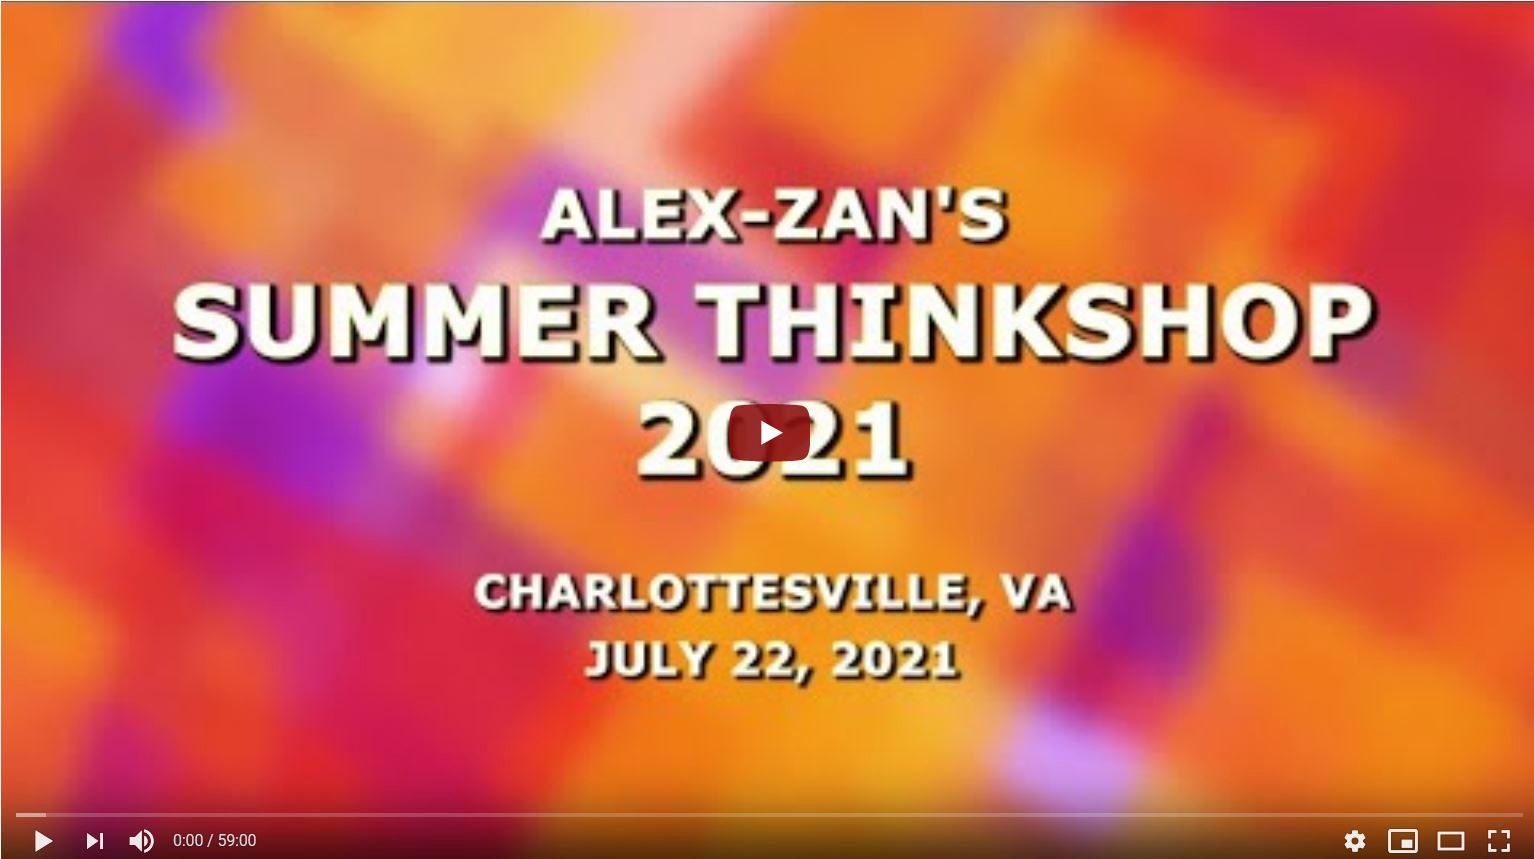 Alex-Zan Summer Thinkshop 2021 Video